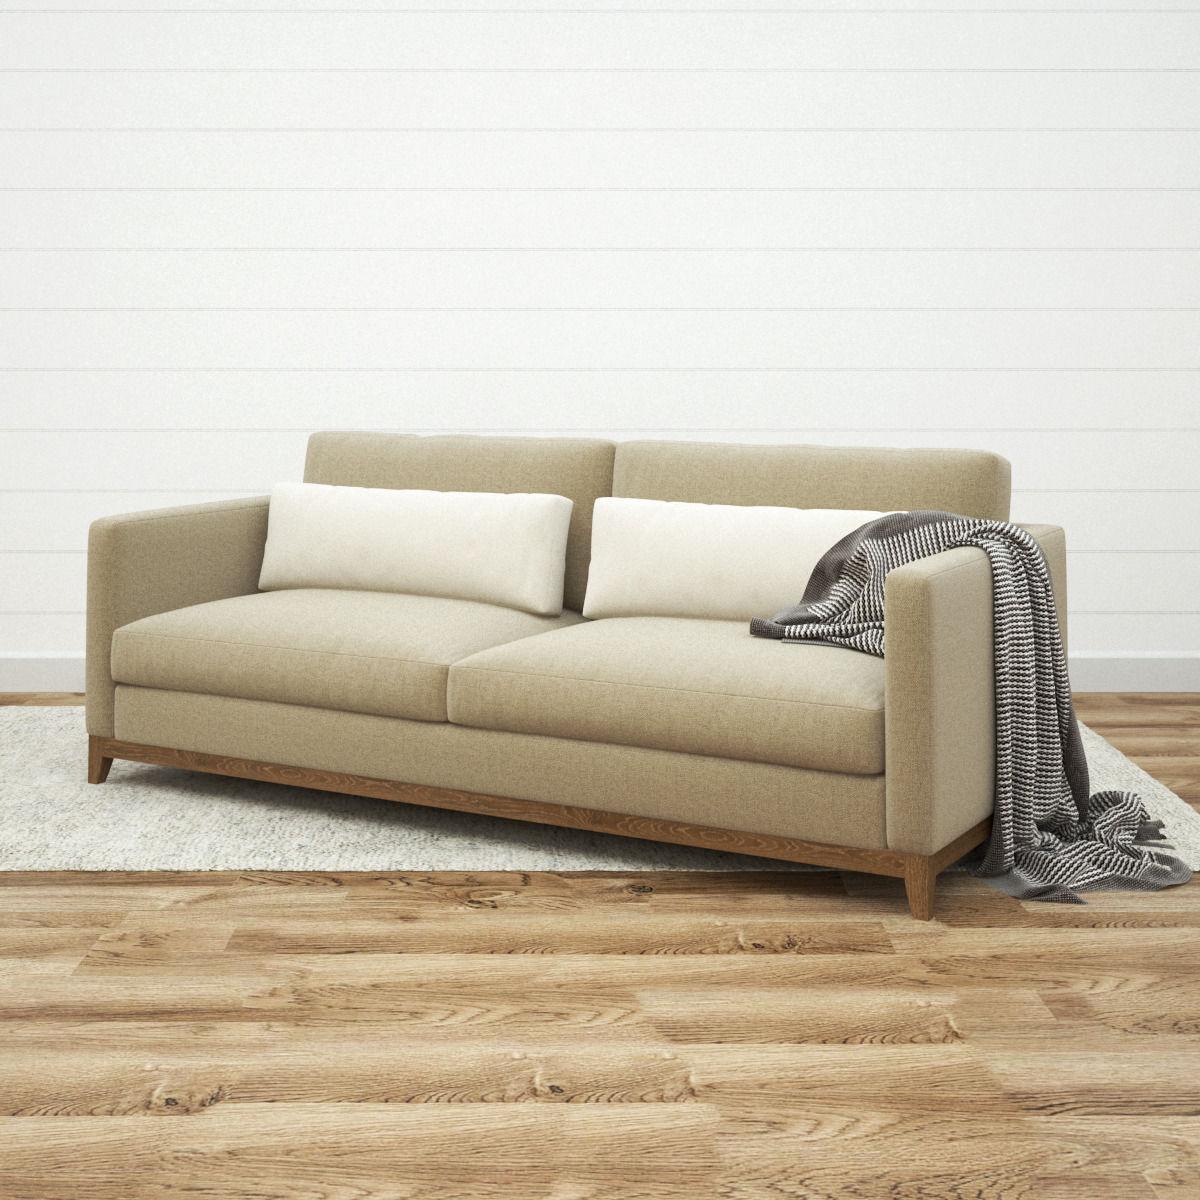 Uncategorized Crate Couch Englishsurvivalkit Home Design